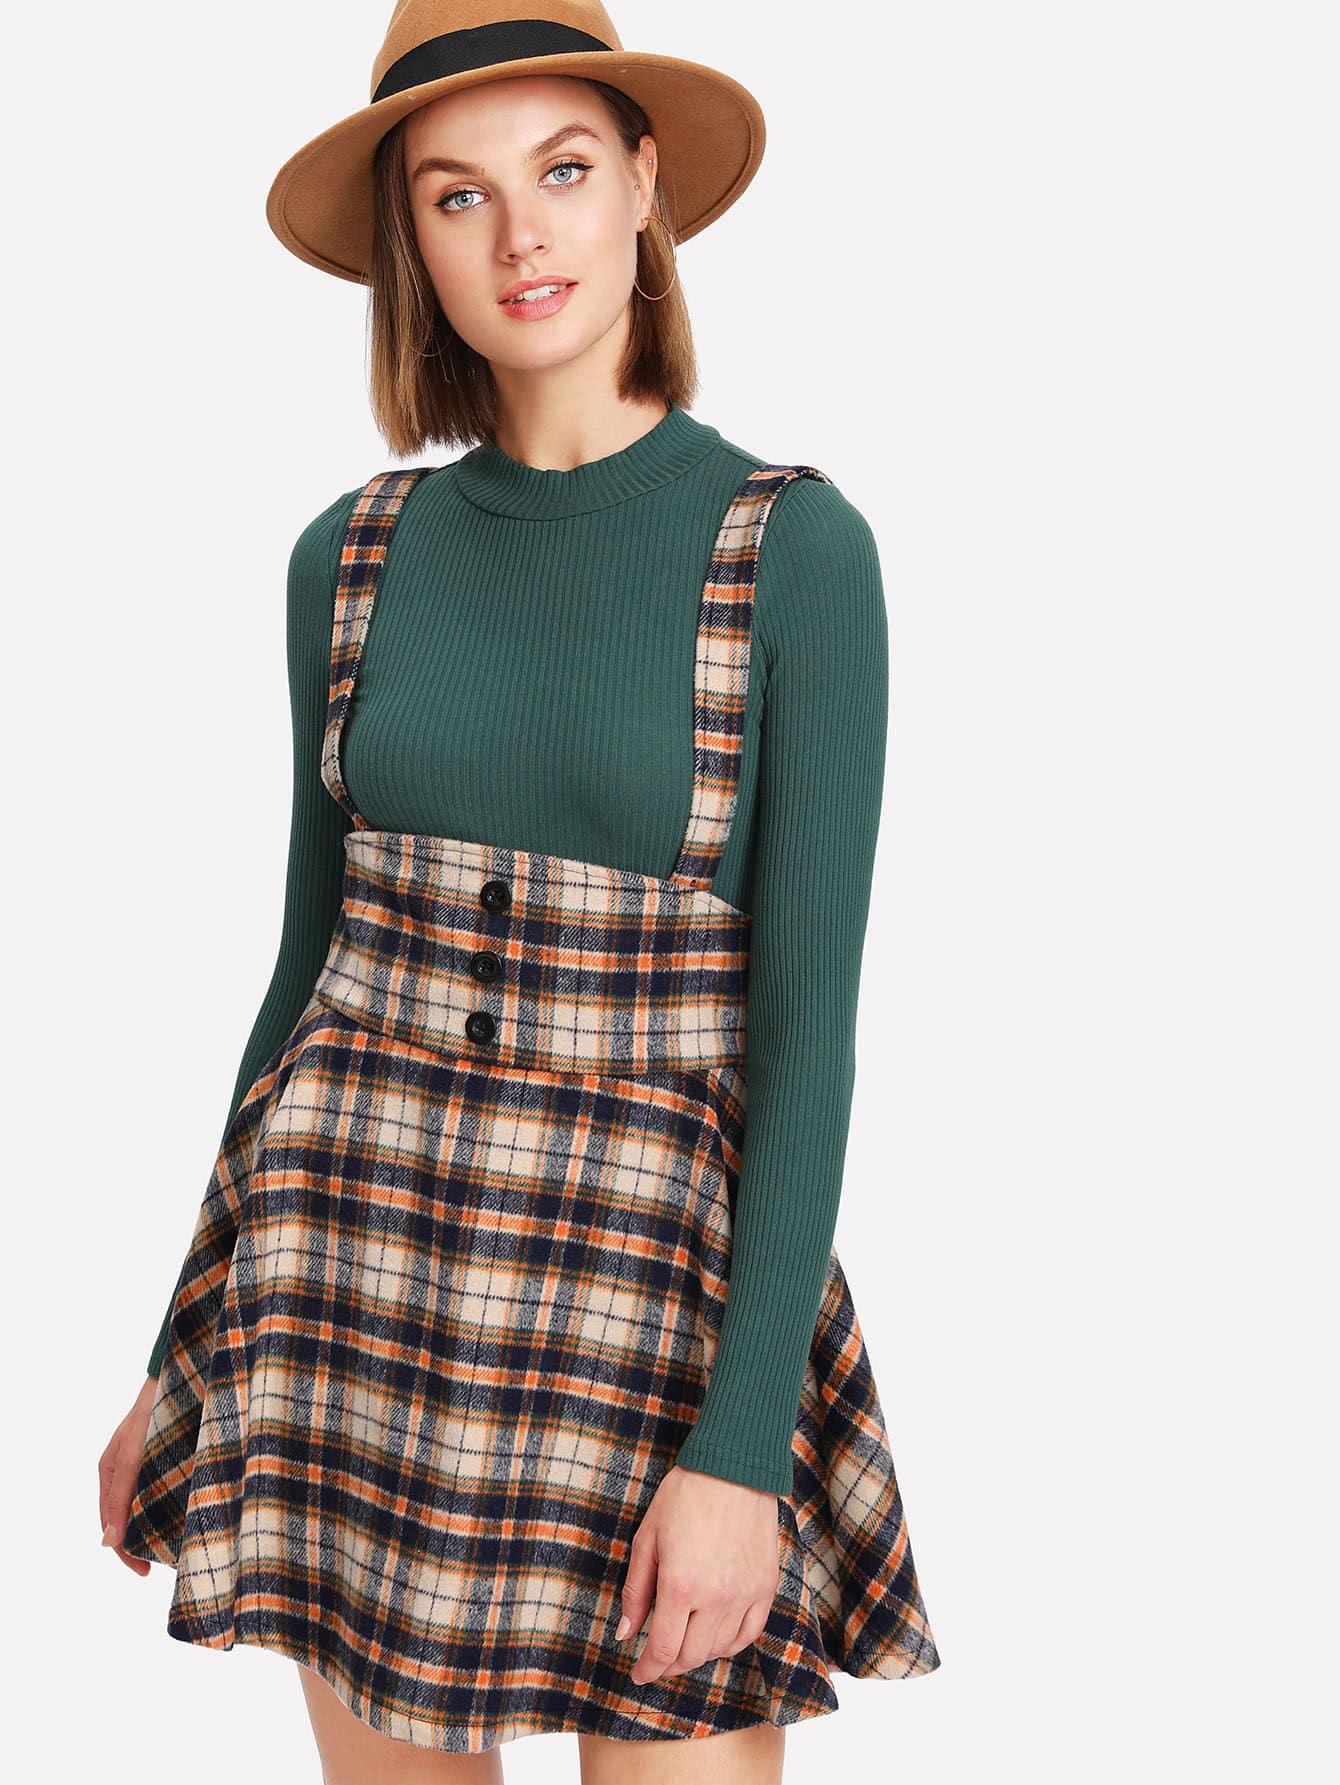 Button Detail Plaid Skirt With Strap джеймс эшер bhakta ranga rasa india новый взгляд mp3